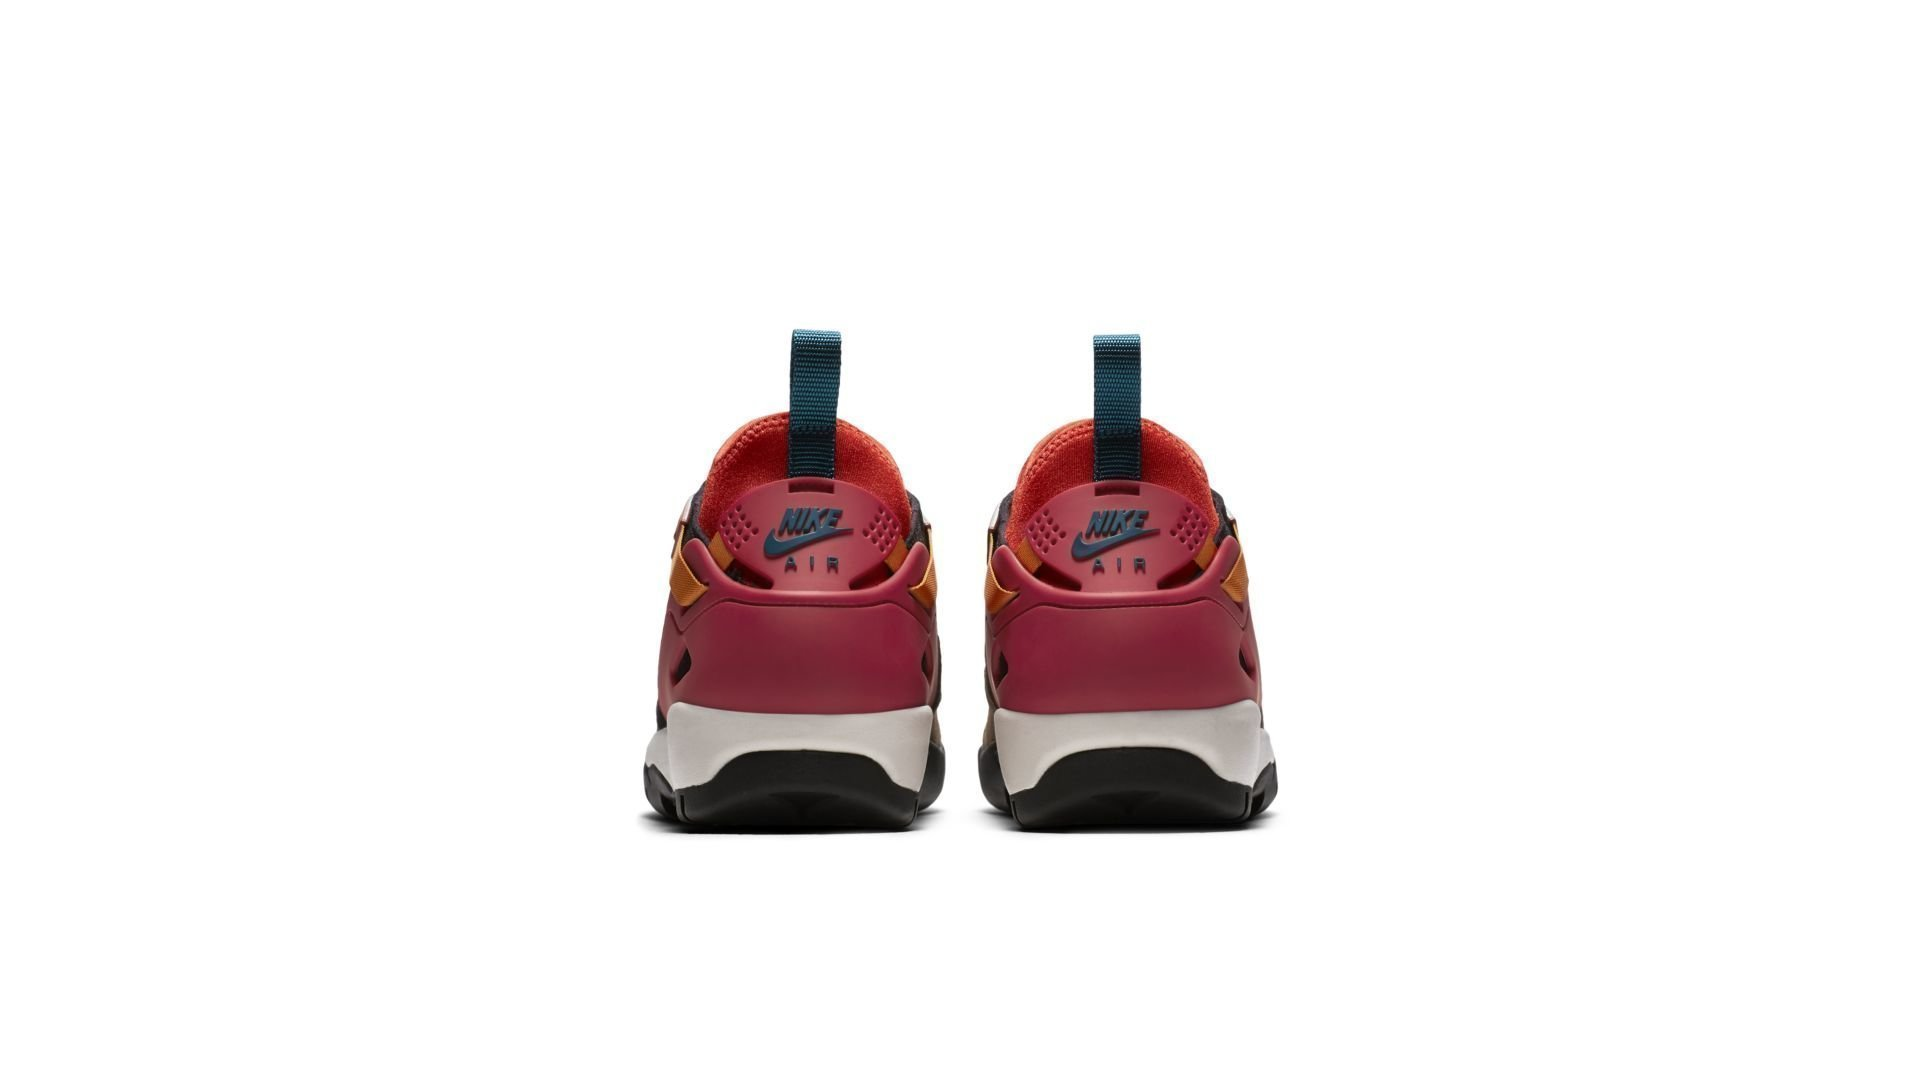 Nike Air Revaderchi Outback Throwback (AR0479-600)